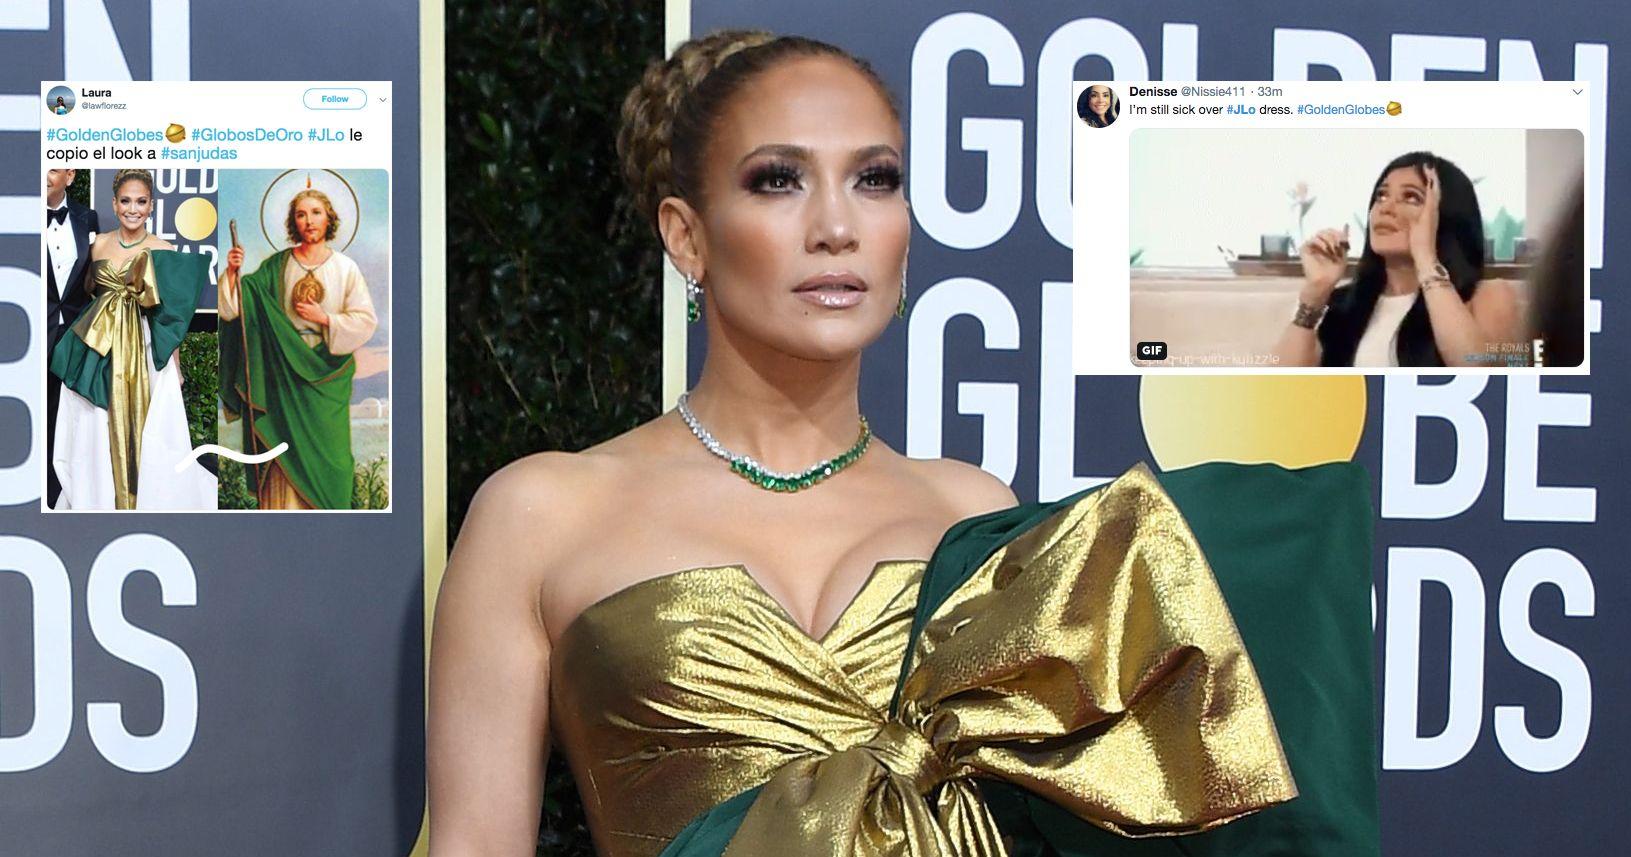 Best Twitter Reactions To Jennifer Lopez Golden Globes Dress